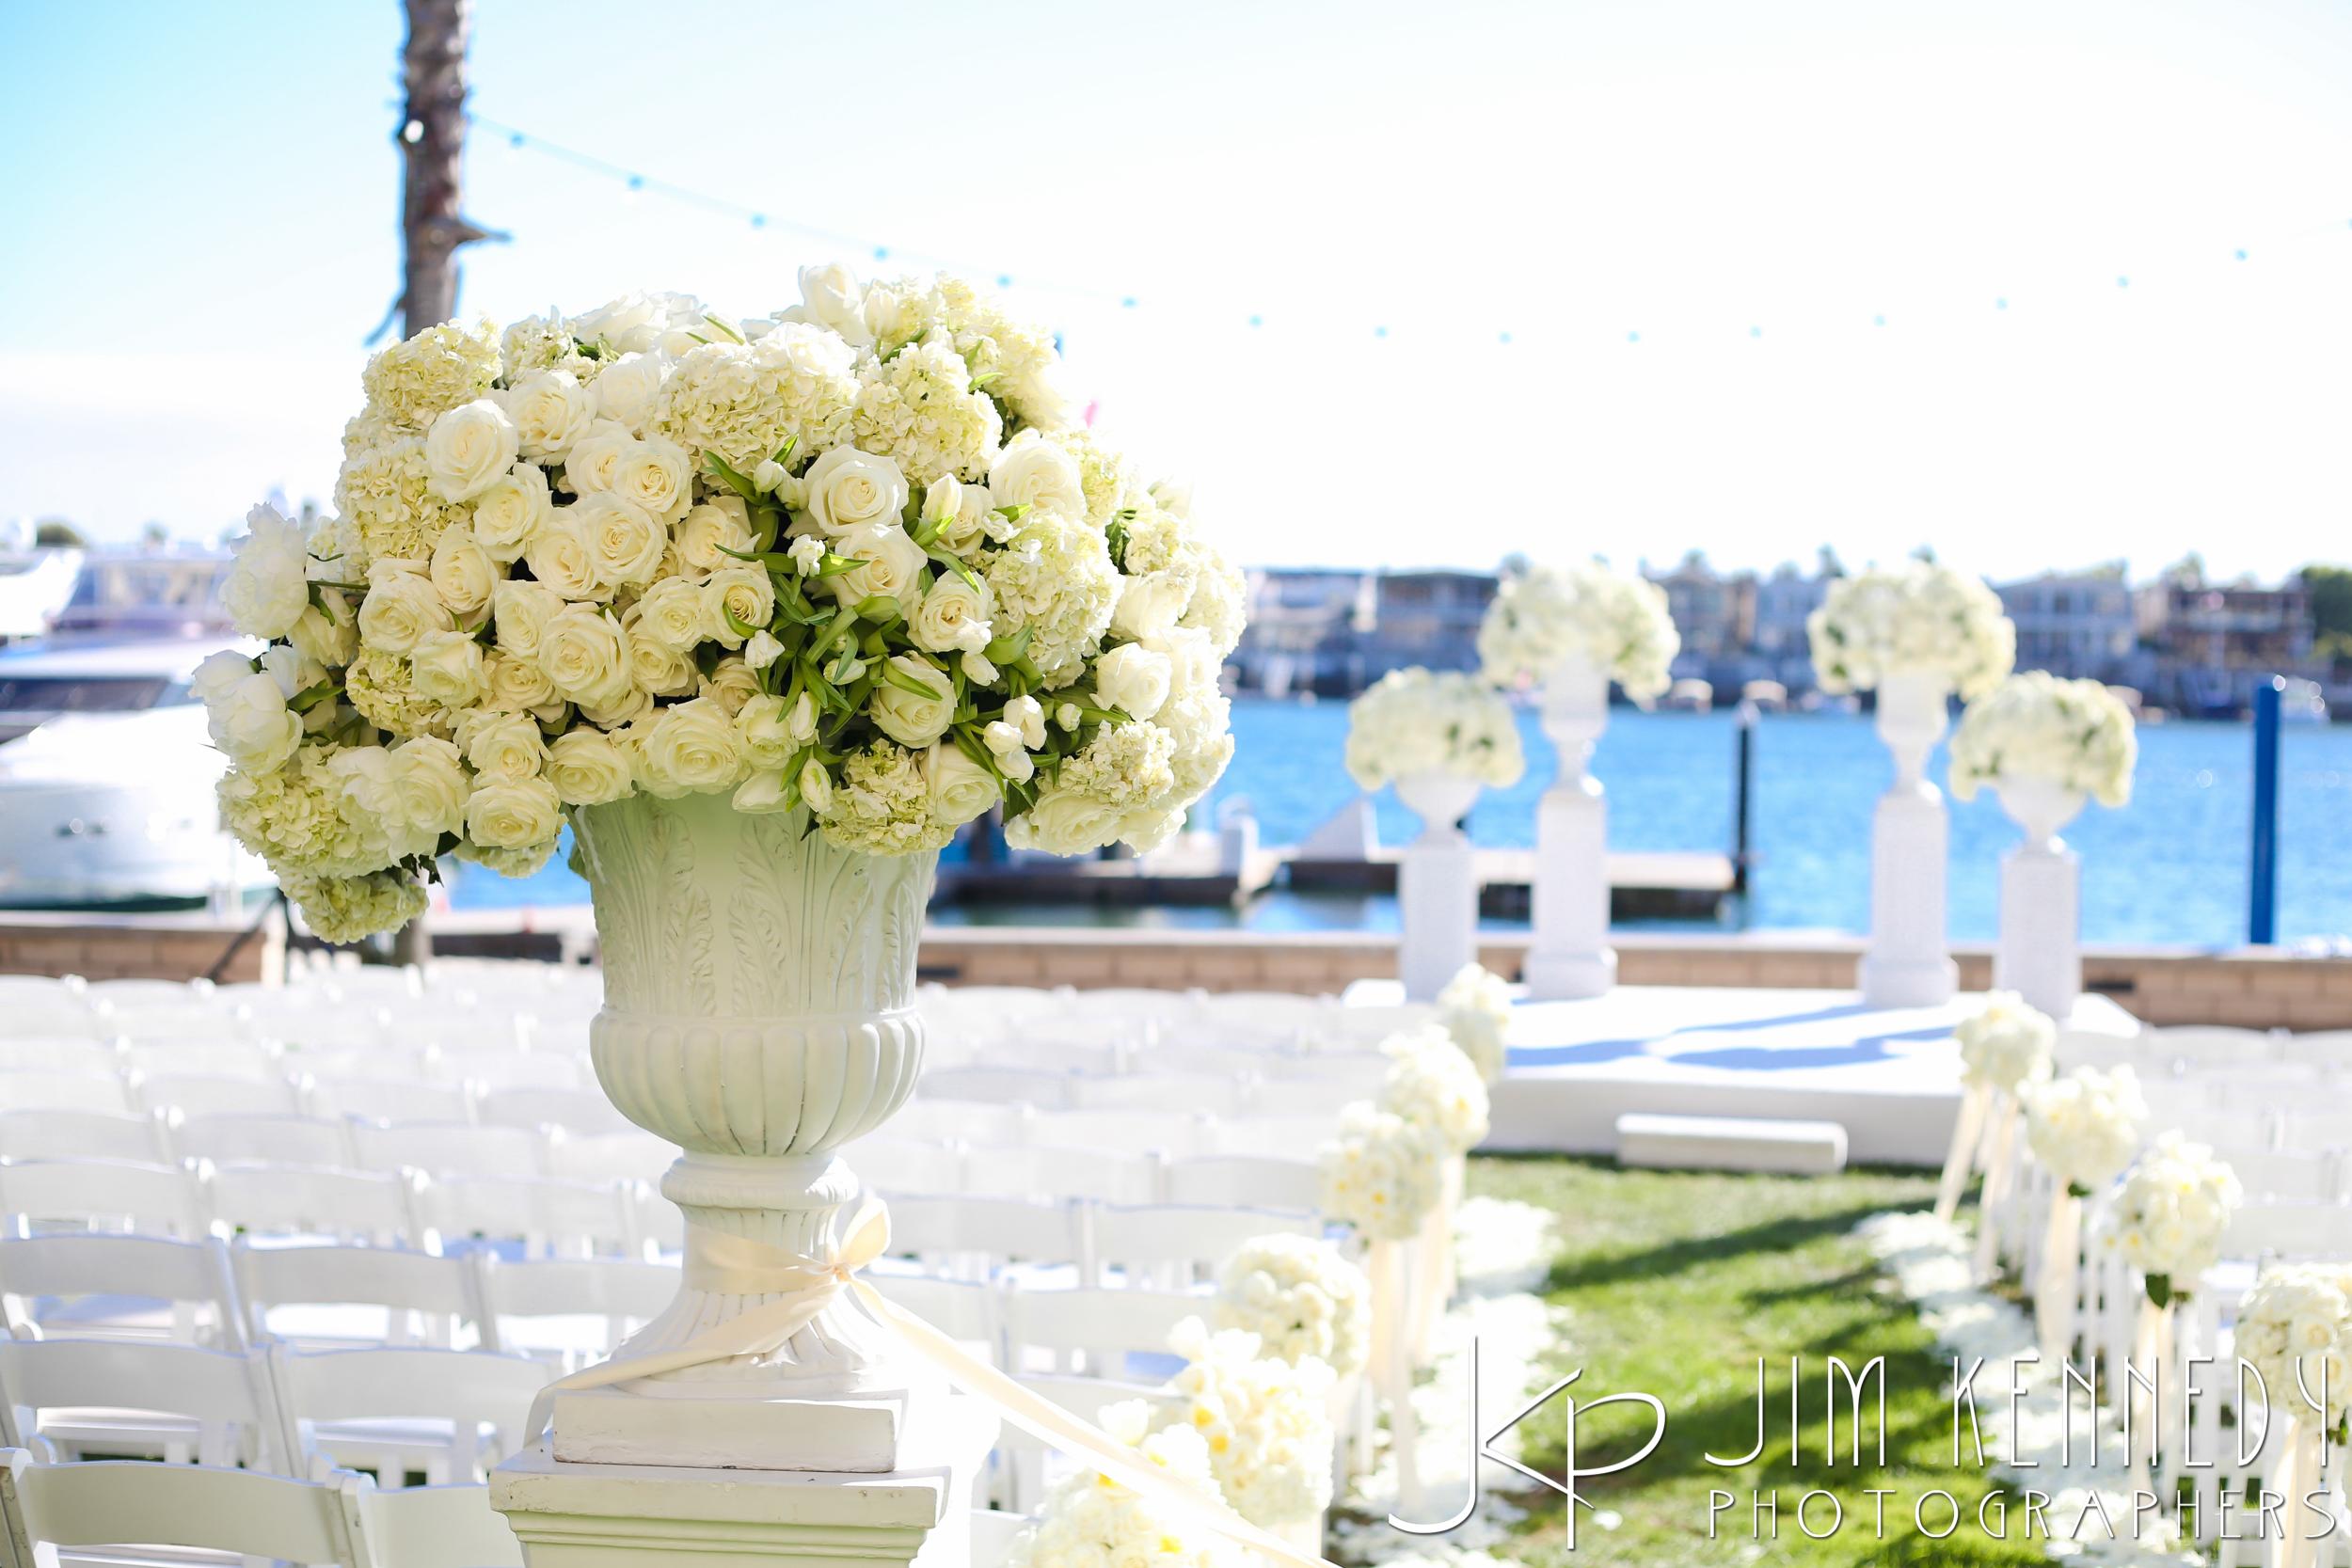 balboa-bay-resort-wedding-photography_0080.JPG